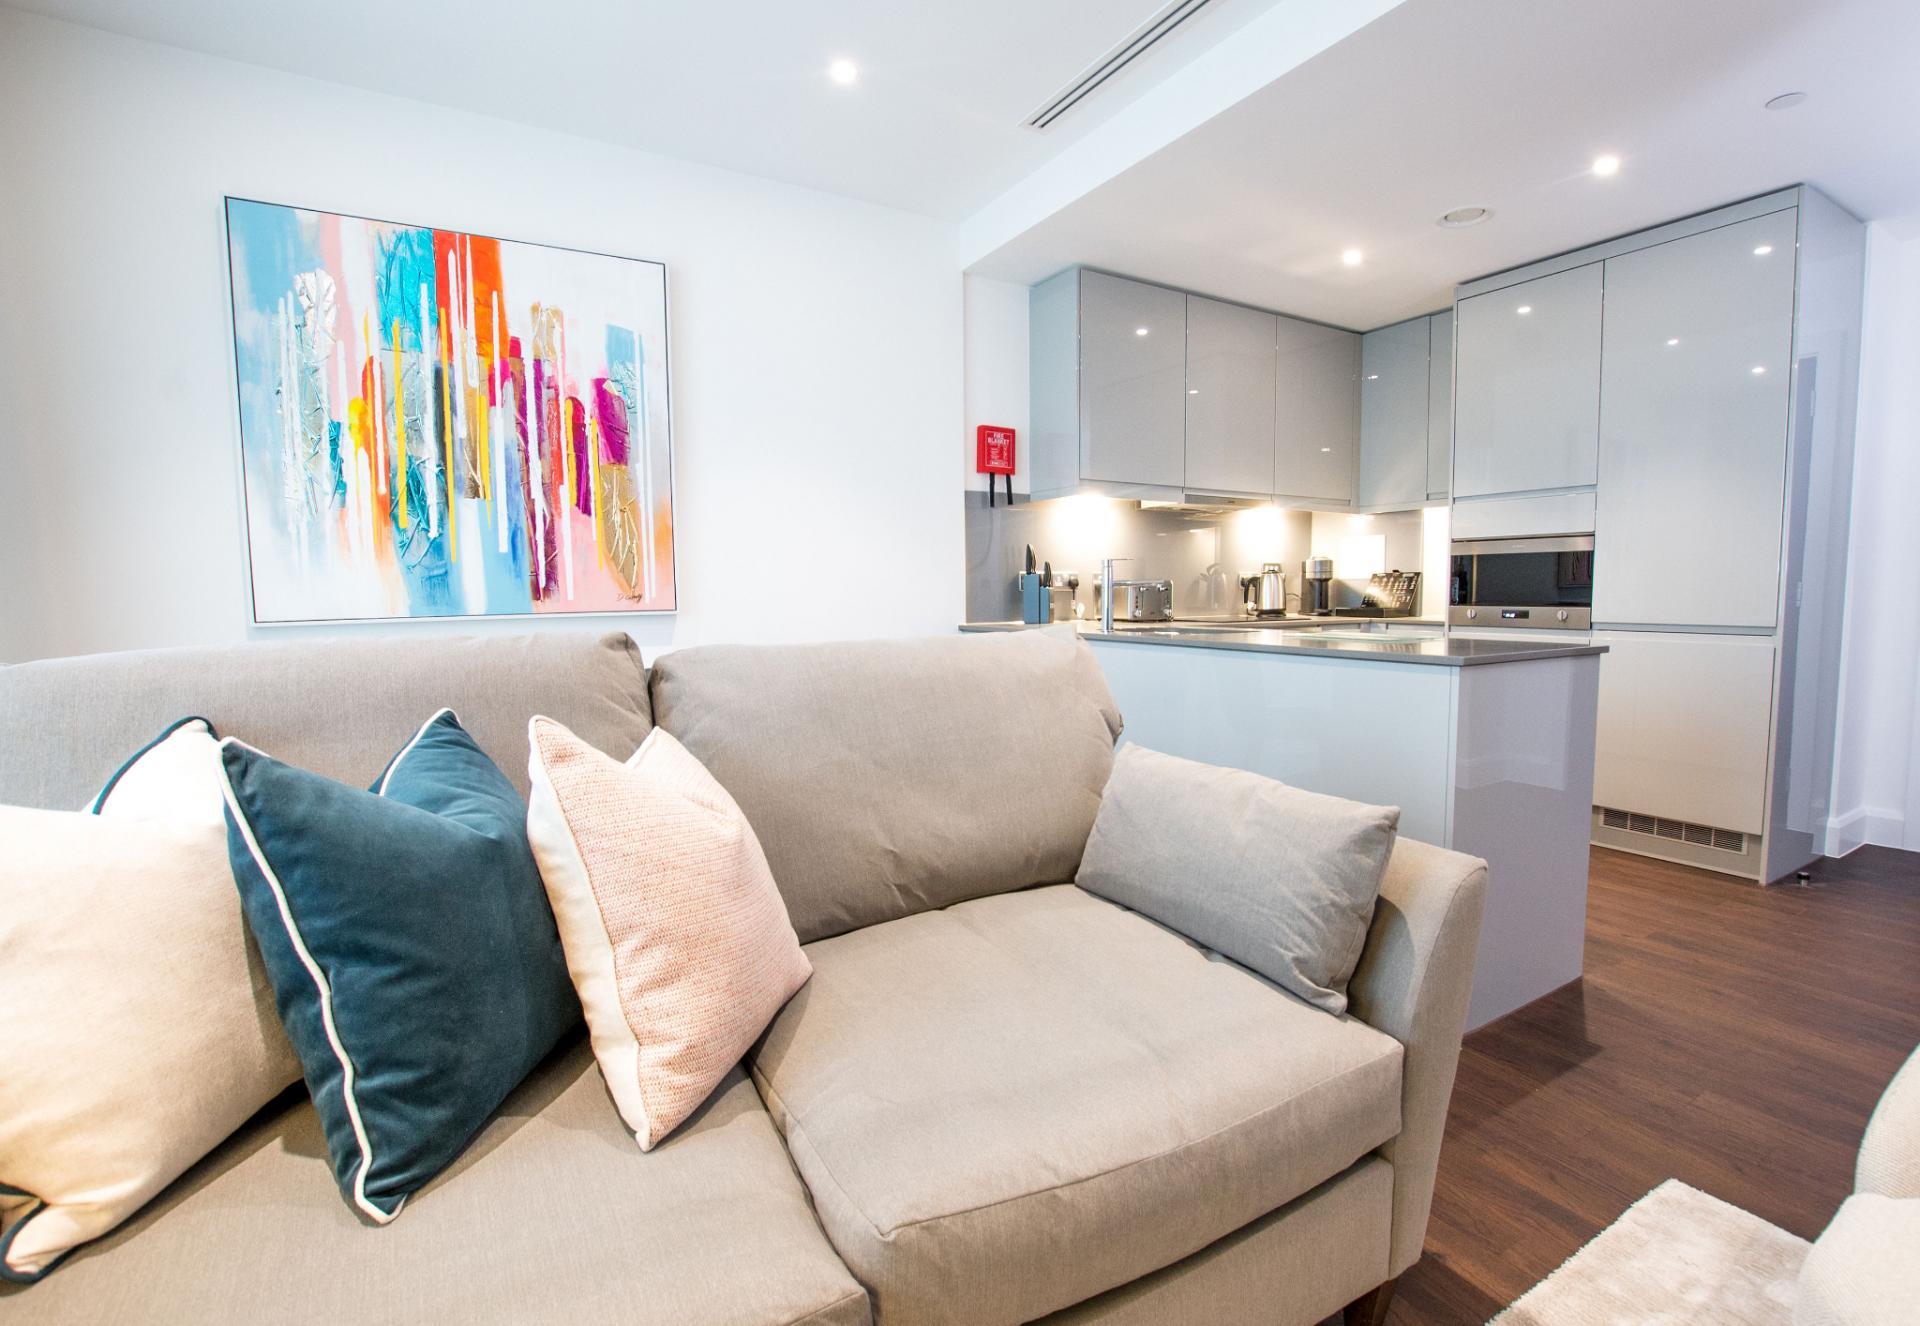 Sofa at Canary Wharf Apartments By Charles Hope, Canary Wharf, London - Citybase Apartments